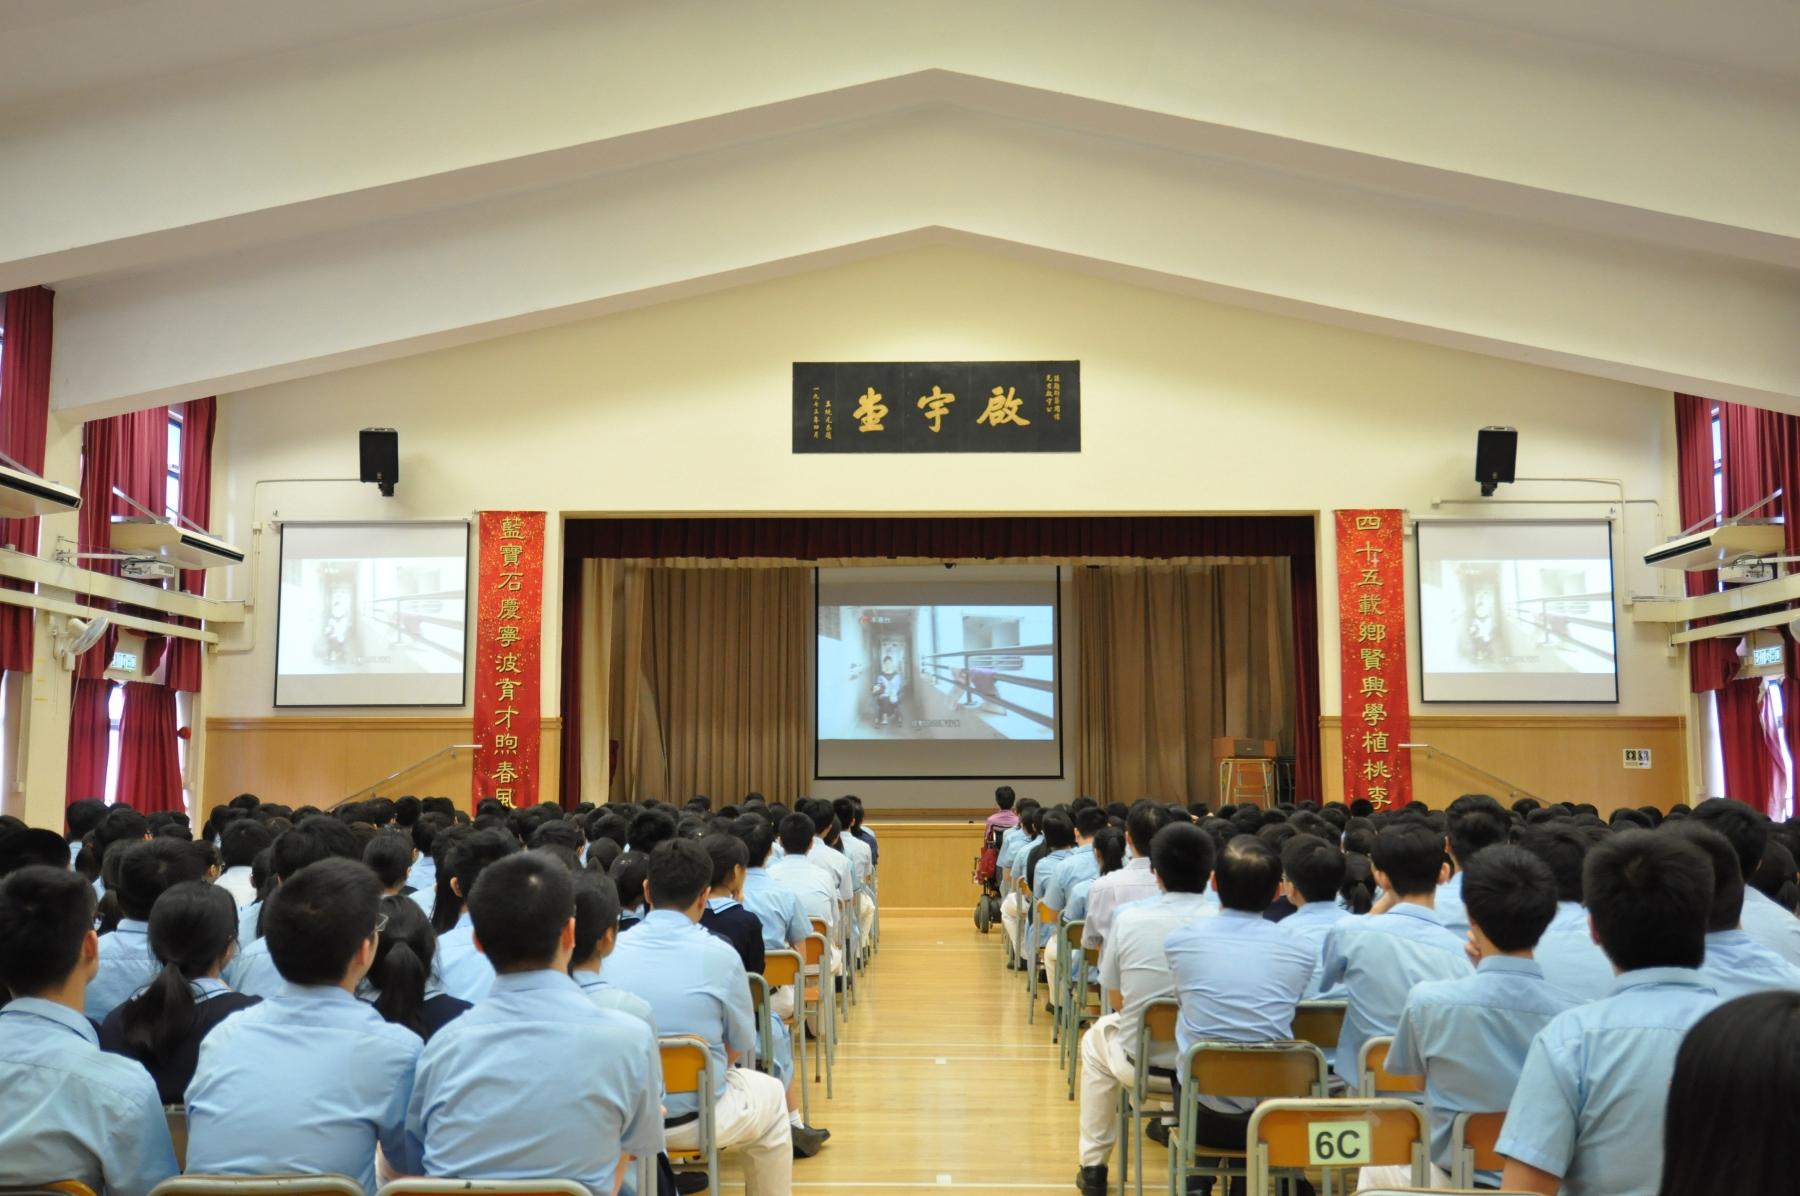 http://www.npc.edu.hk/sites/default/files/dsc_0203_1.jpg